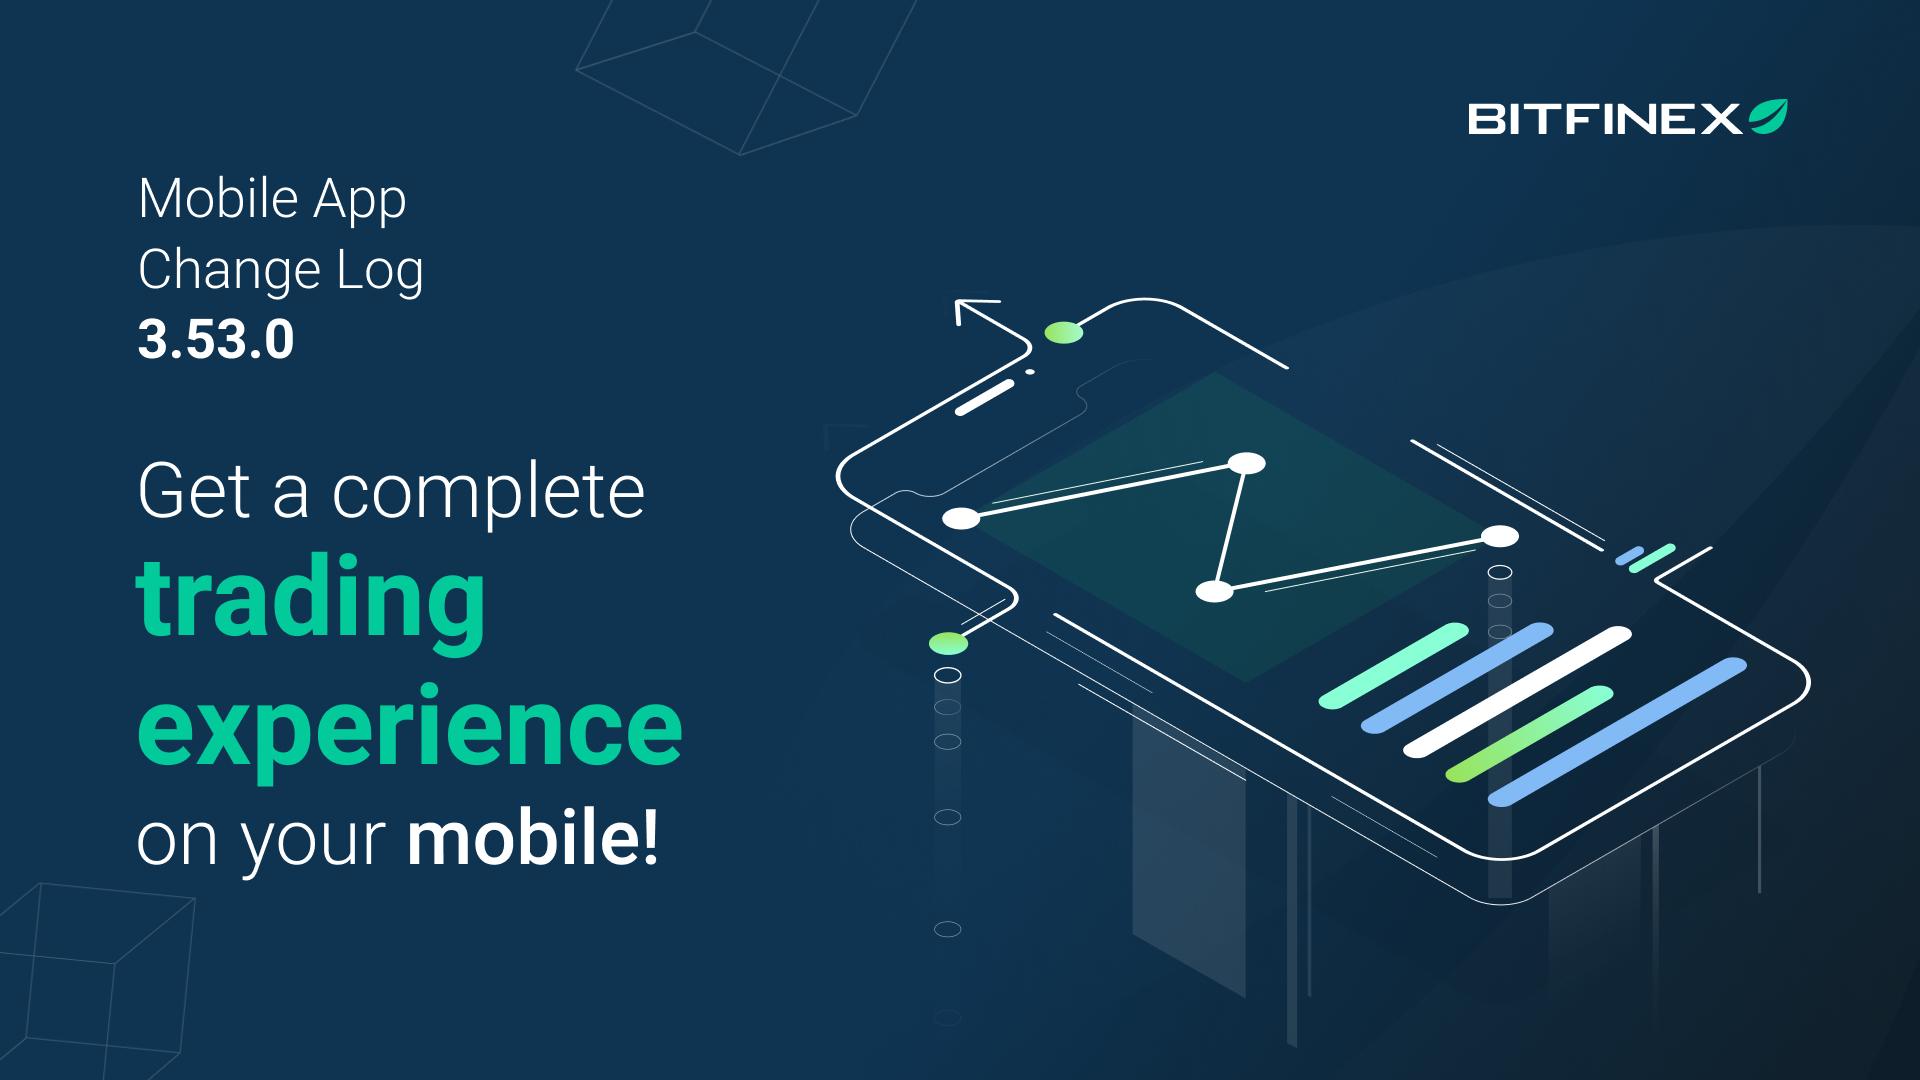 Mobile App Change Log 3.53.0